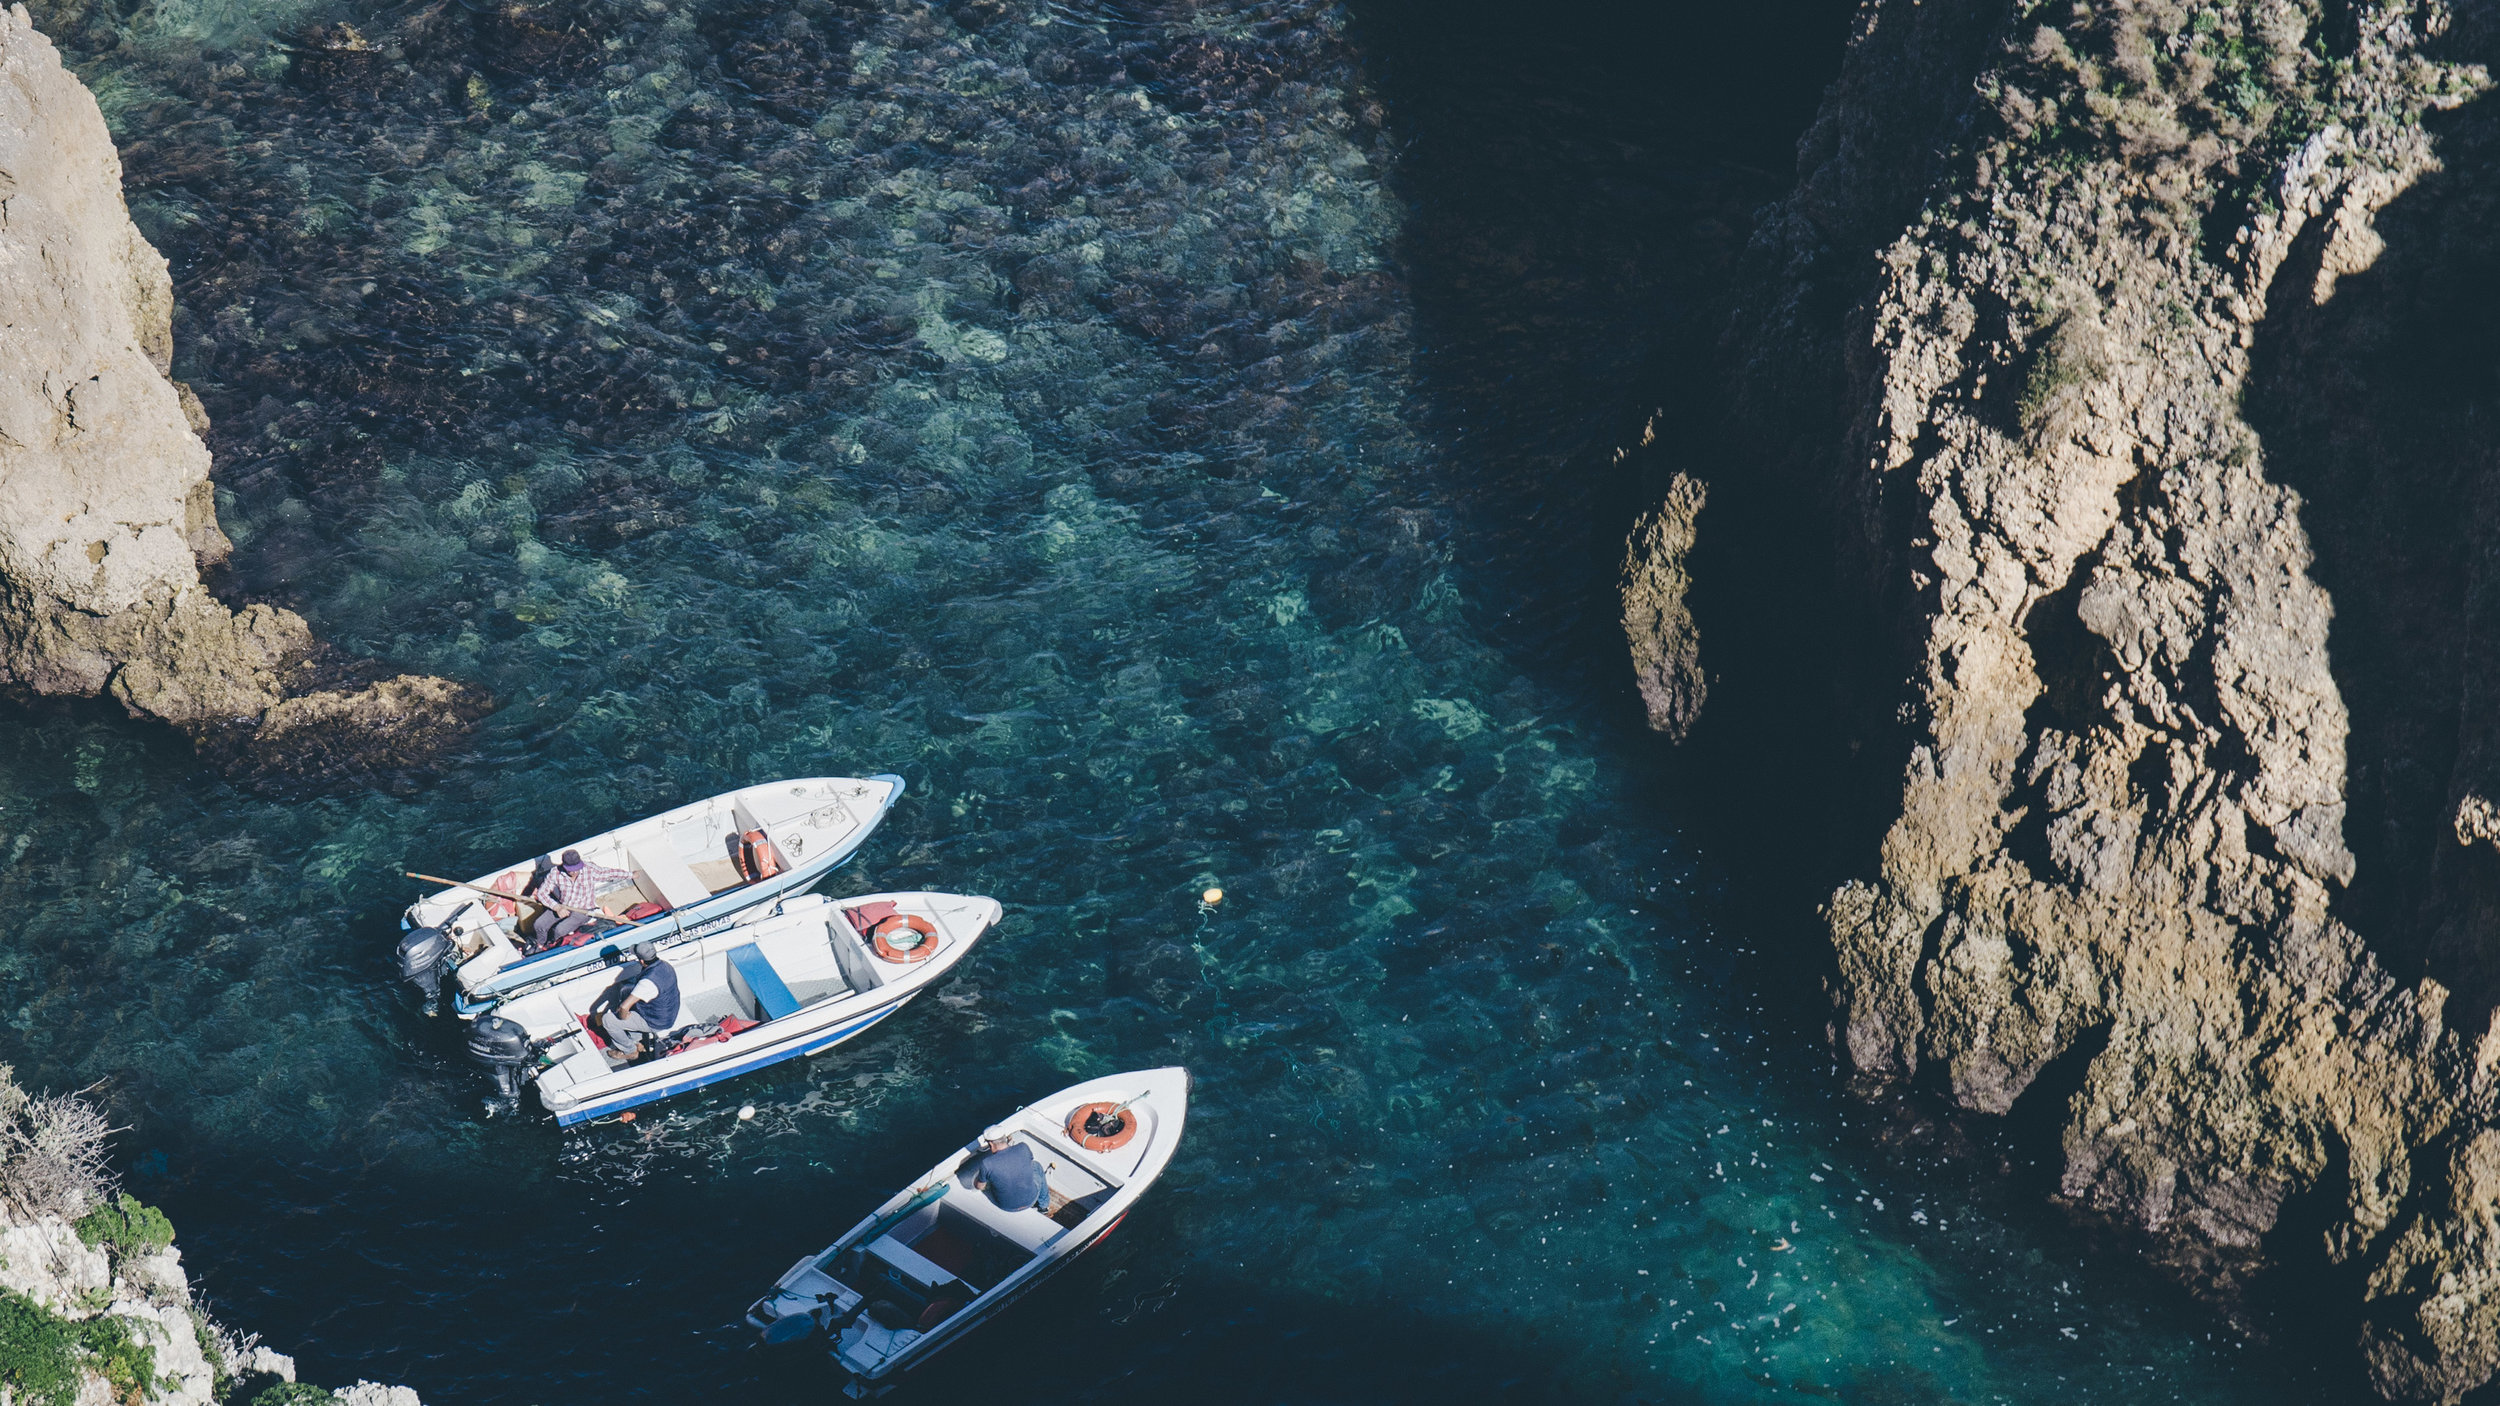 Fishermen with their boats at the bottom of Ponta da Piedade